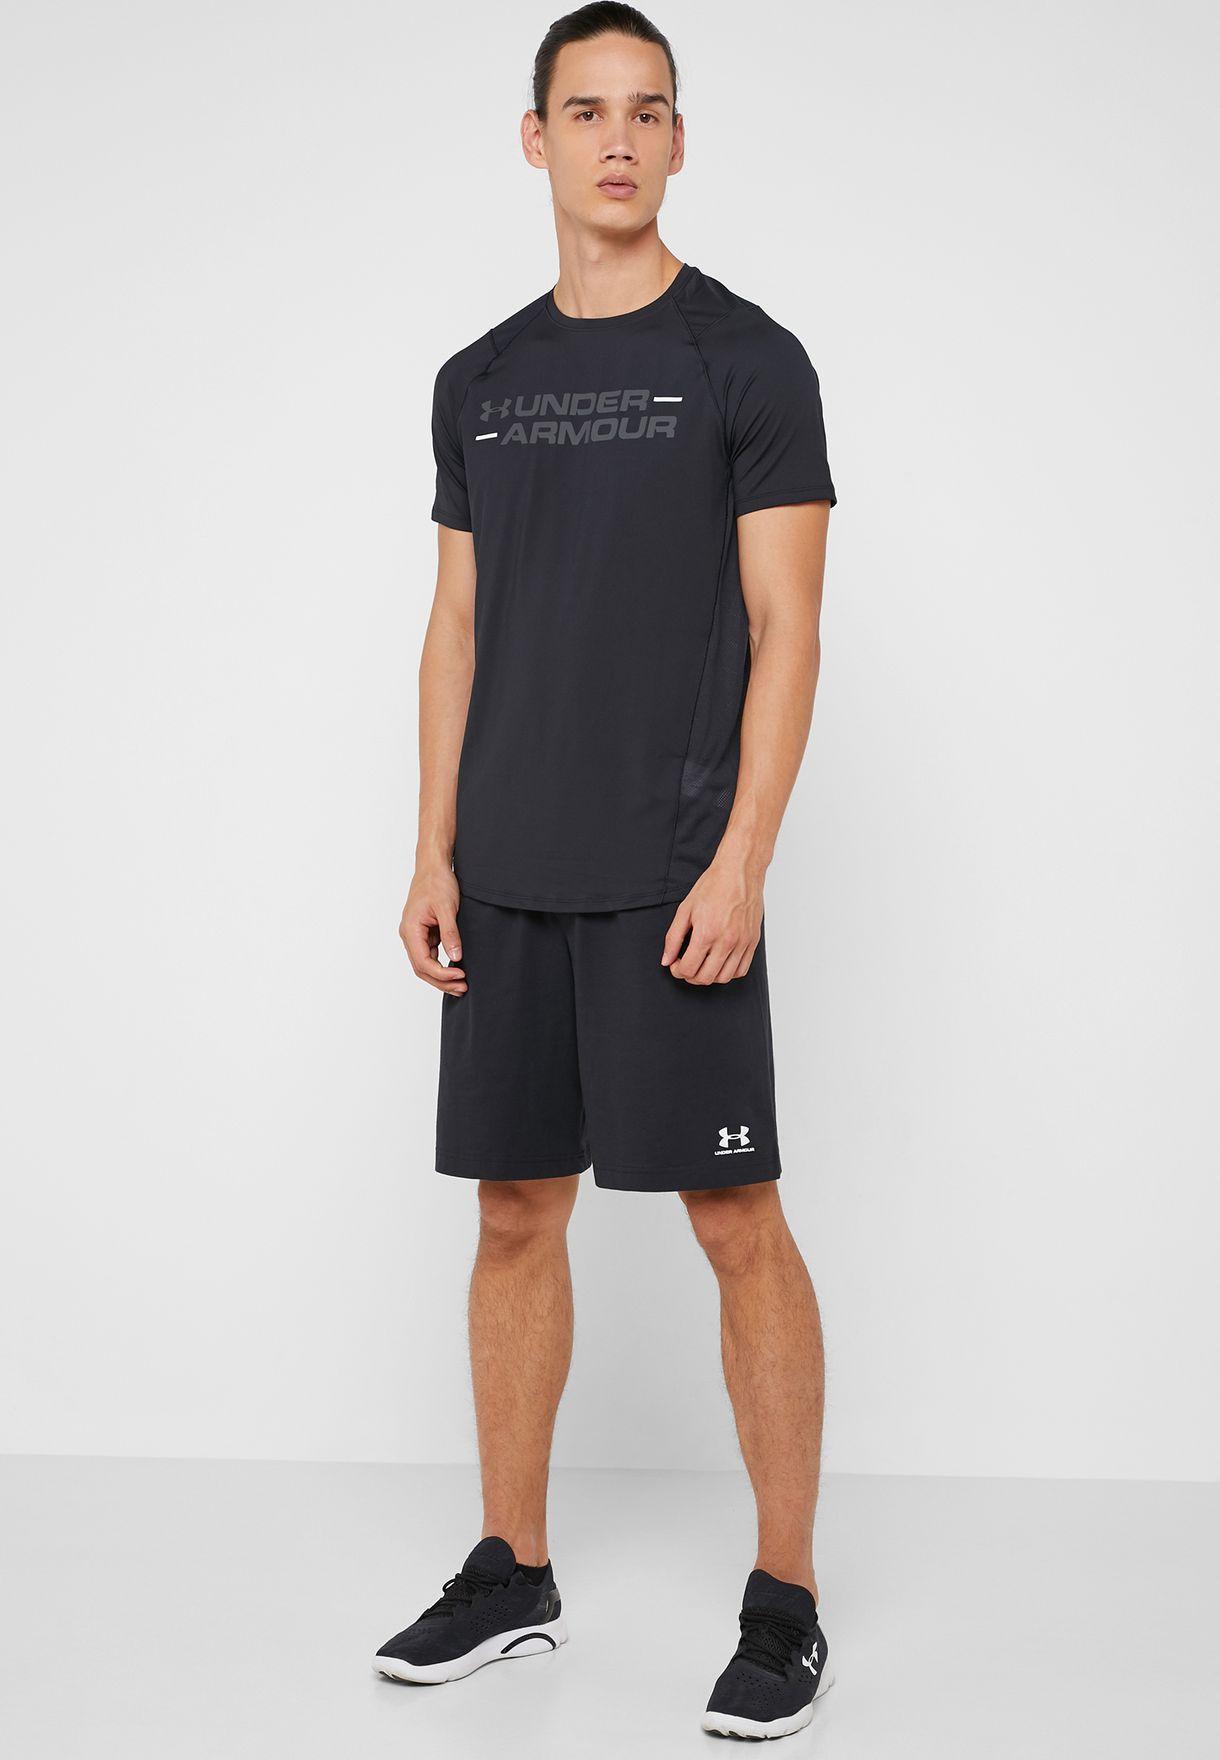 MK1 Wordmark T-Shirt